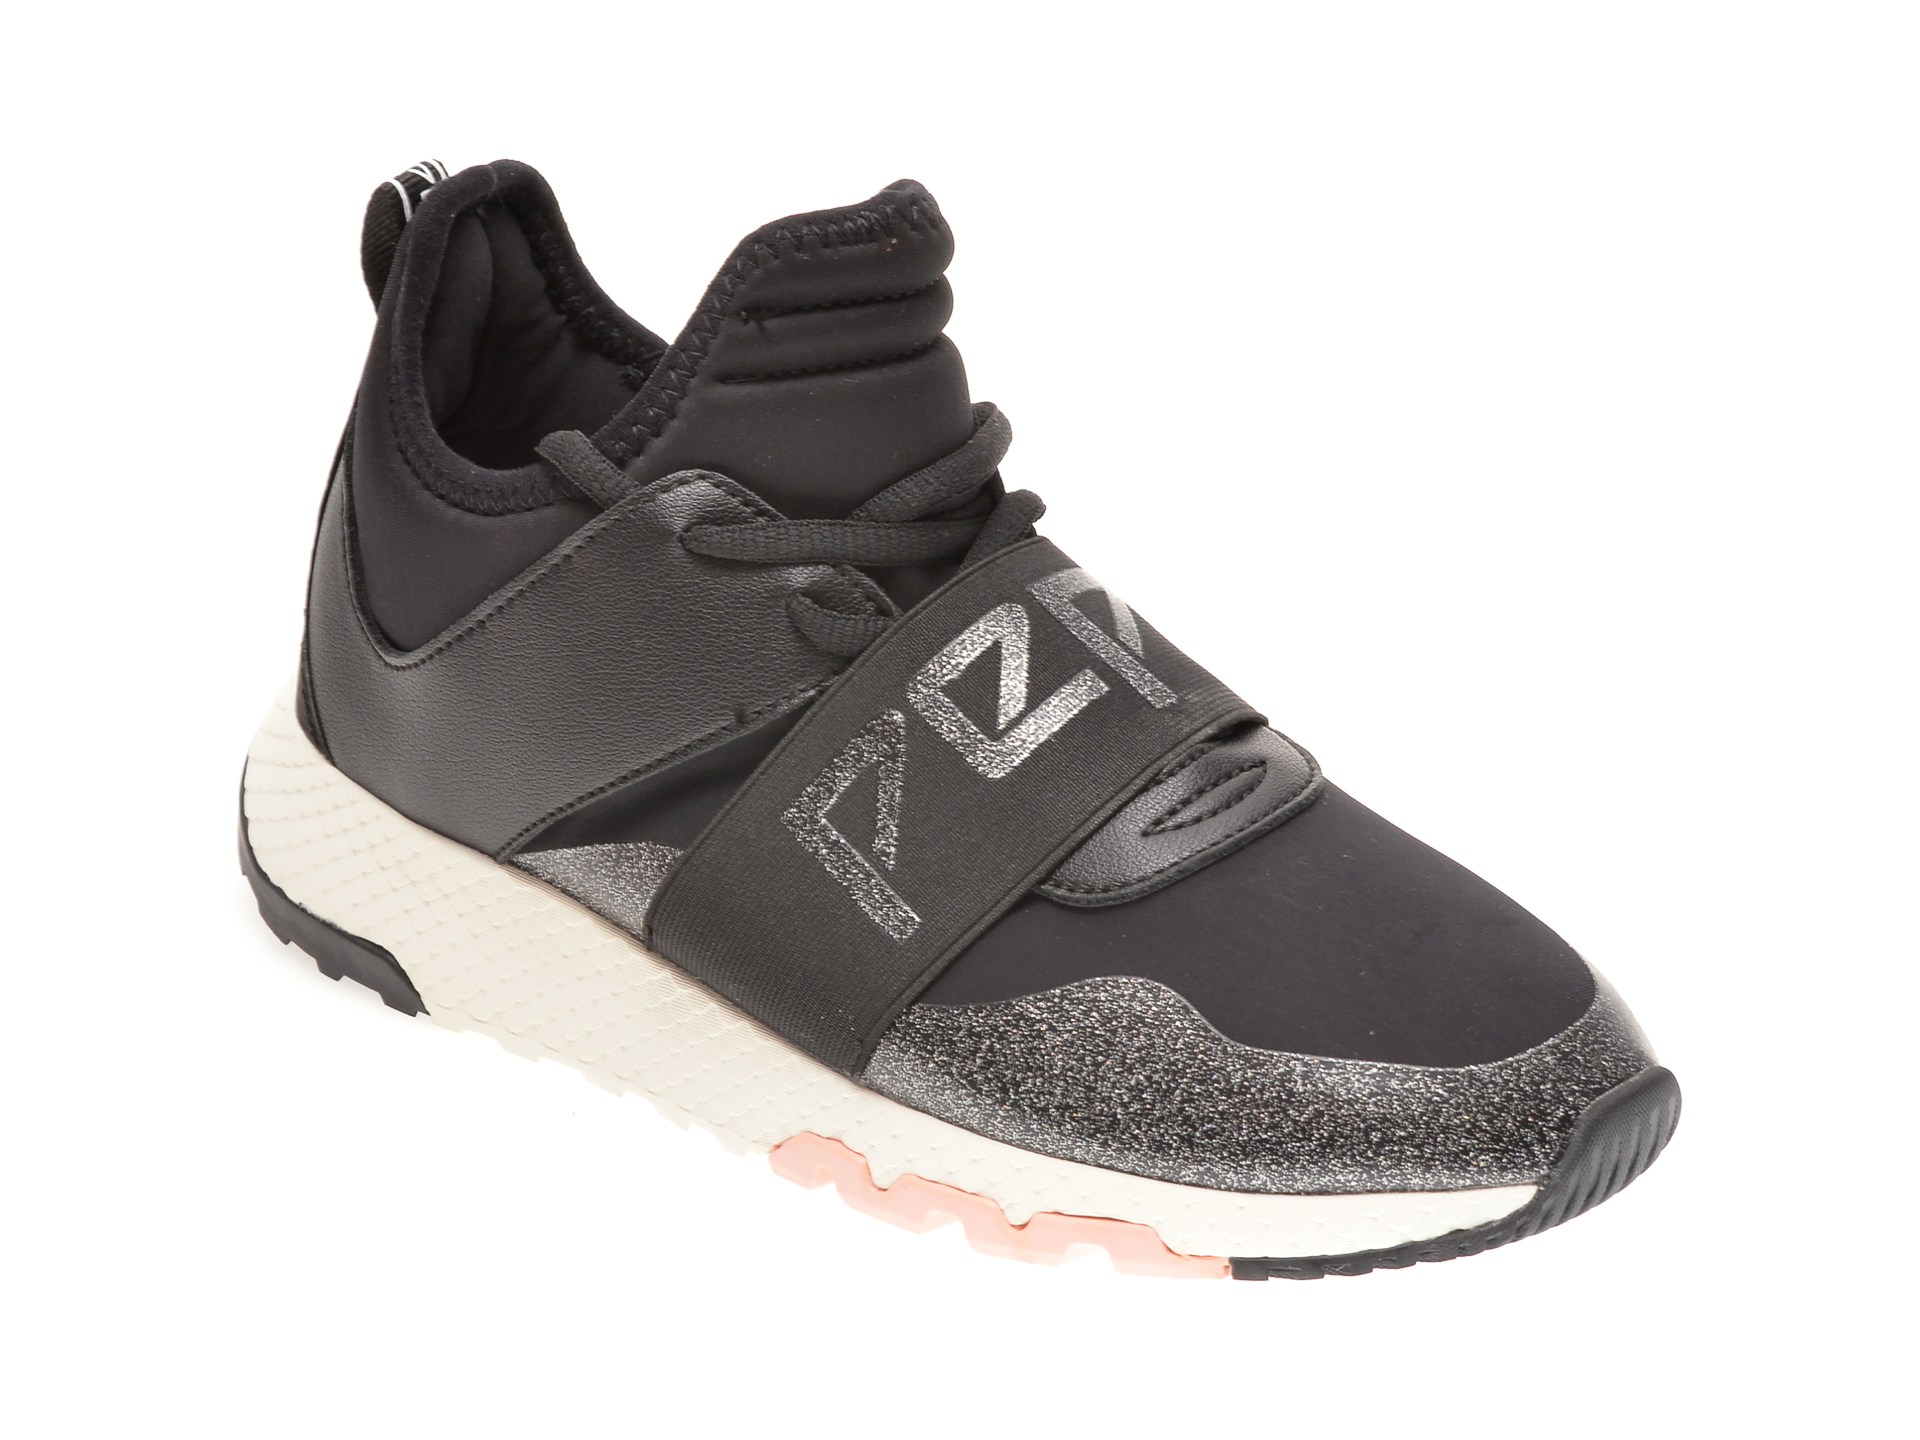 Pantofi sport PEPE JEANS negri, LS31060, din material textil si piele ecologica